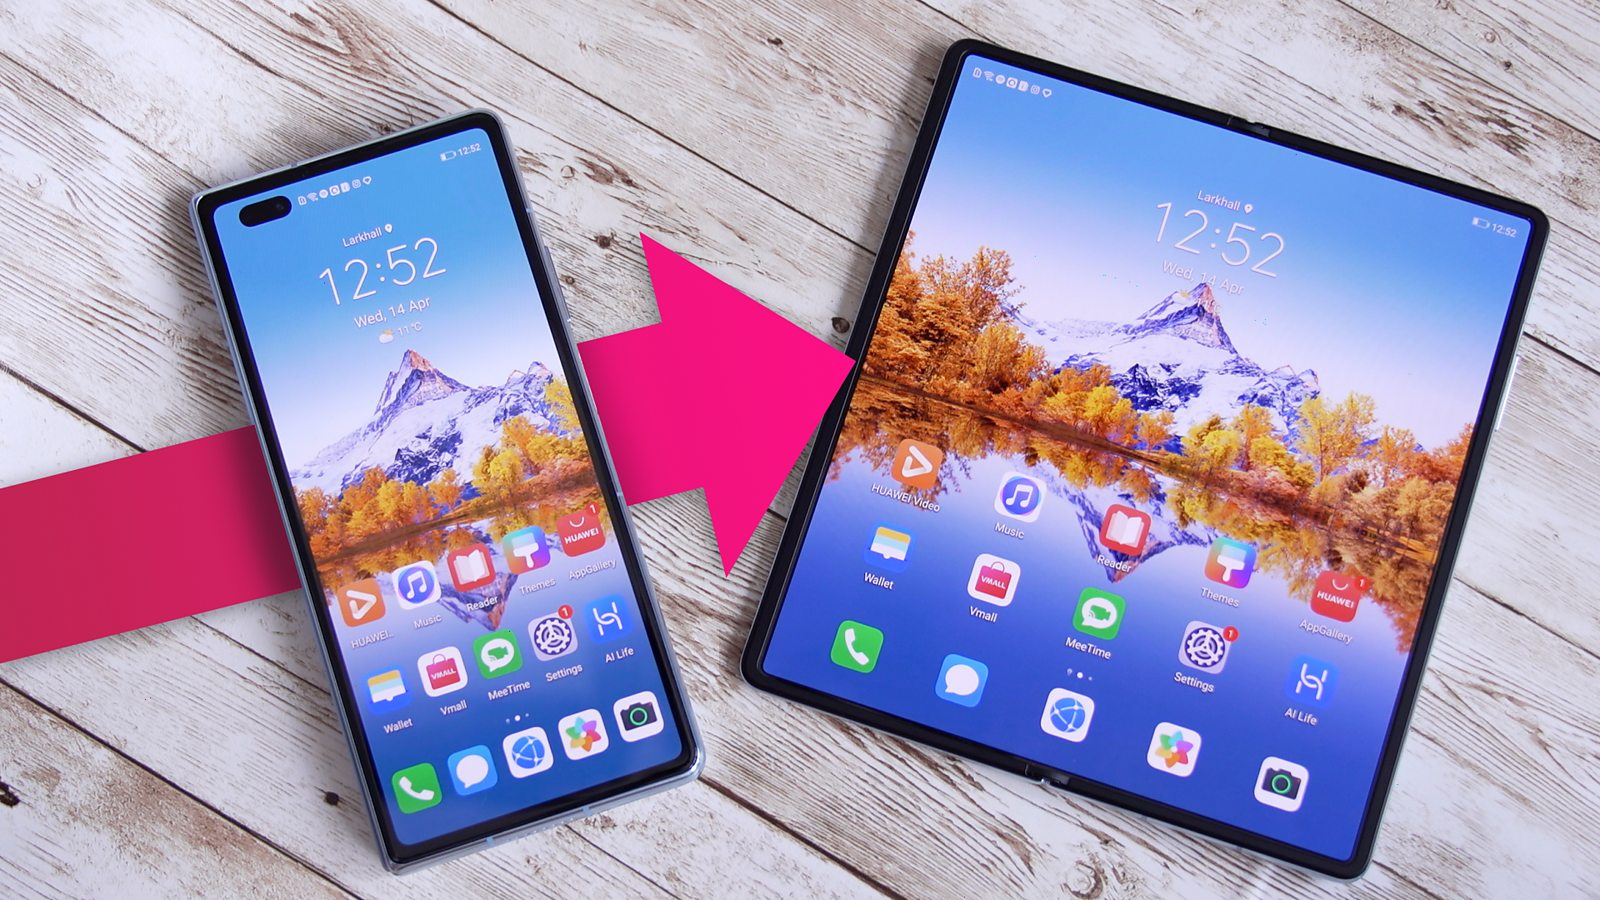 Huawei masters the folding phone formula